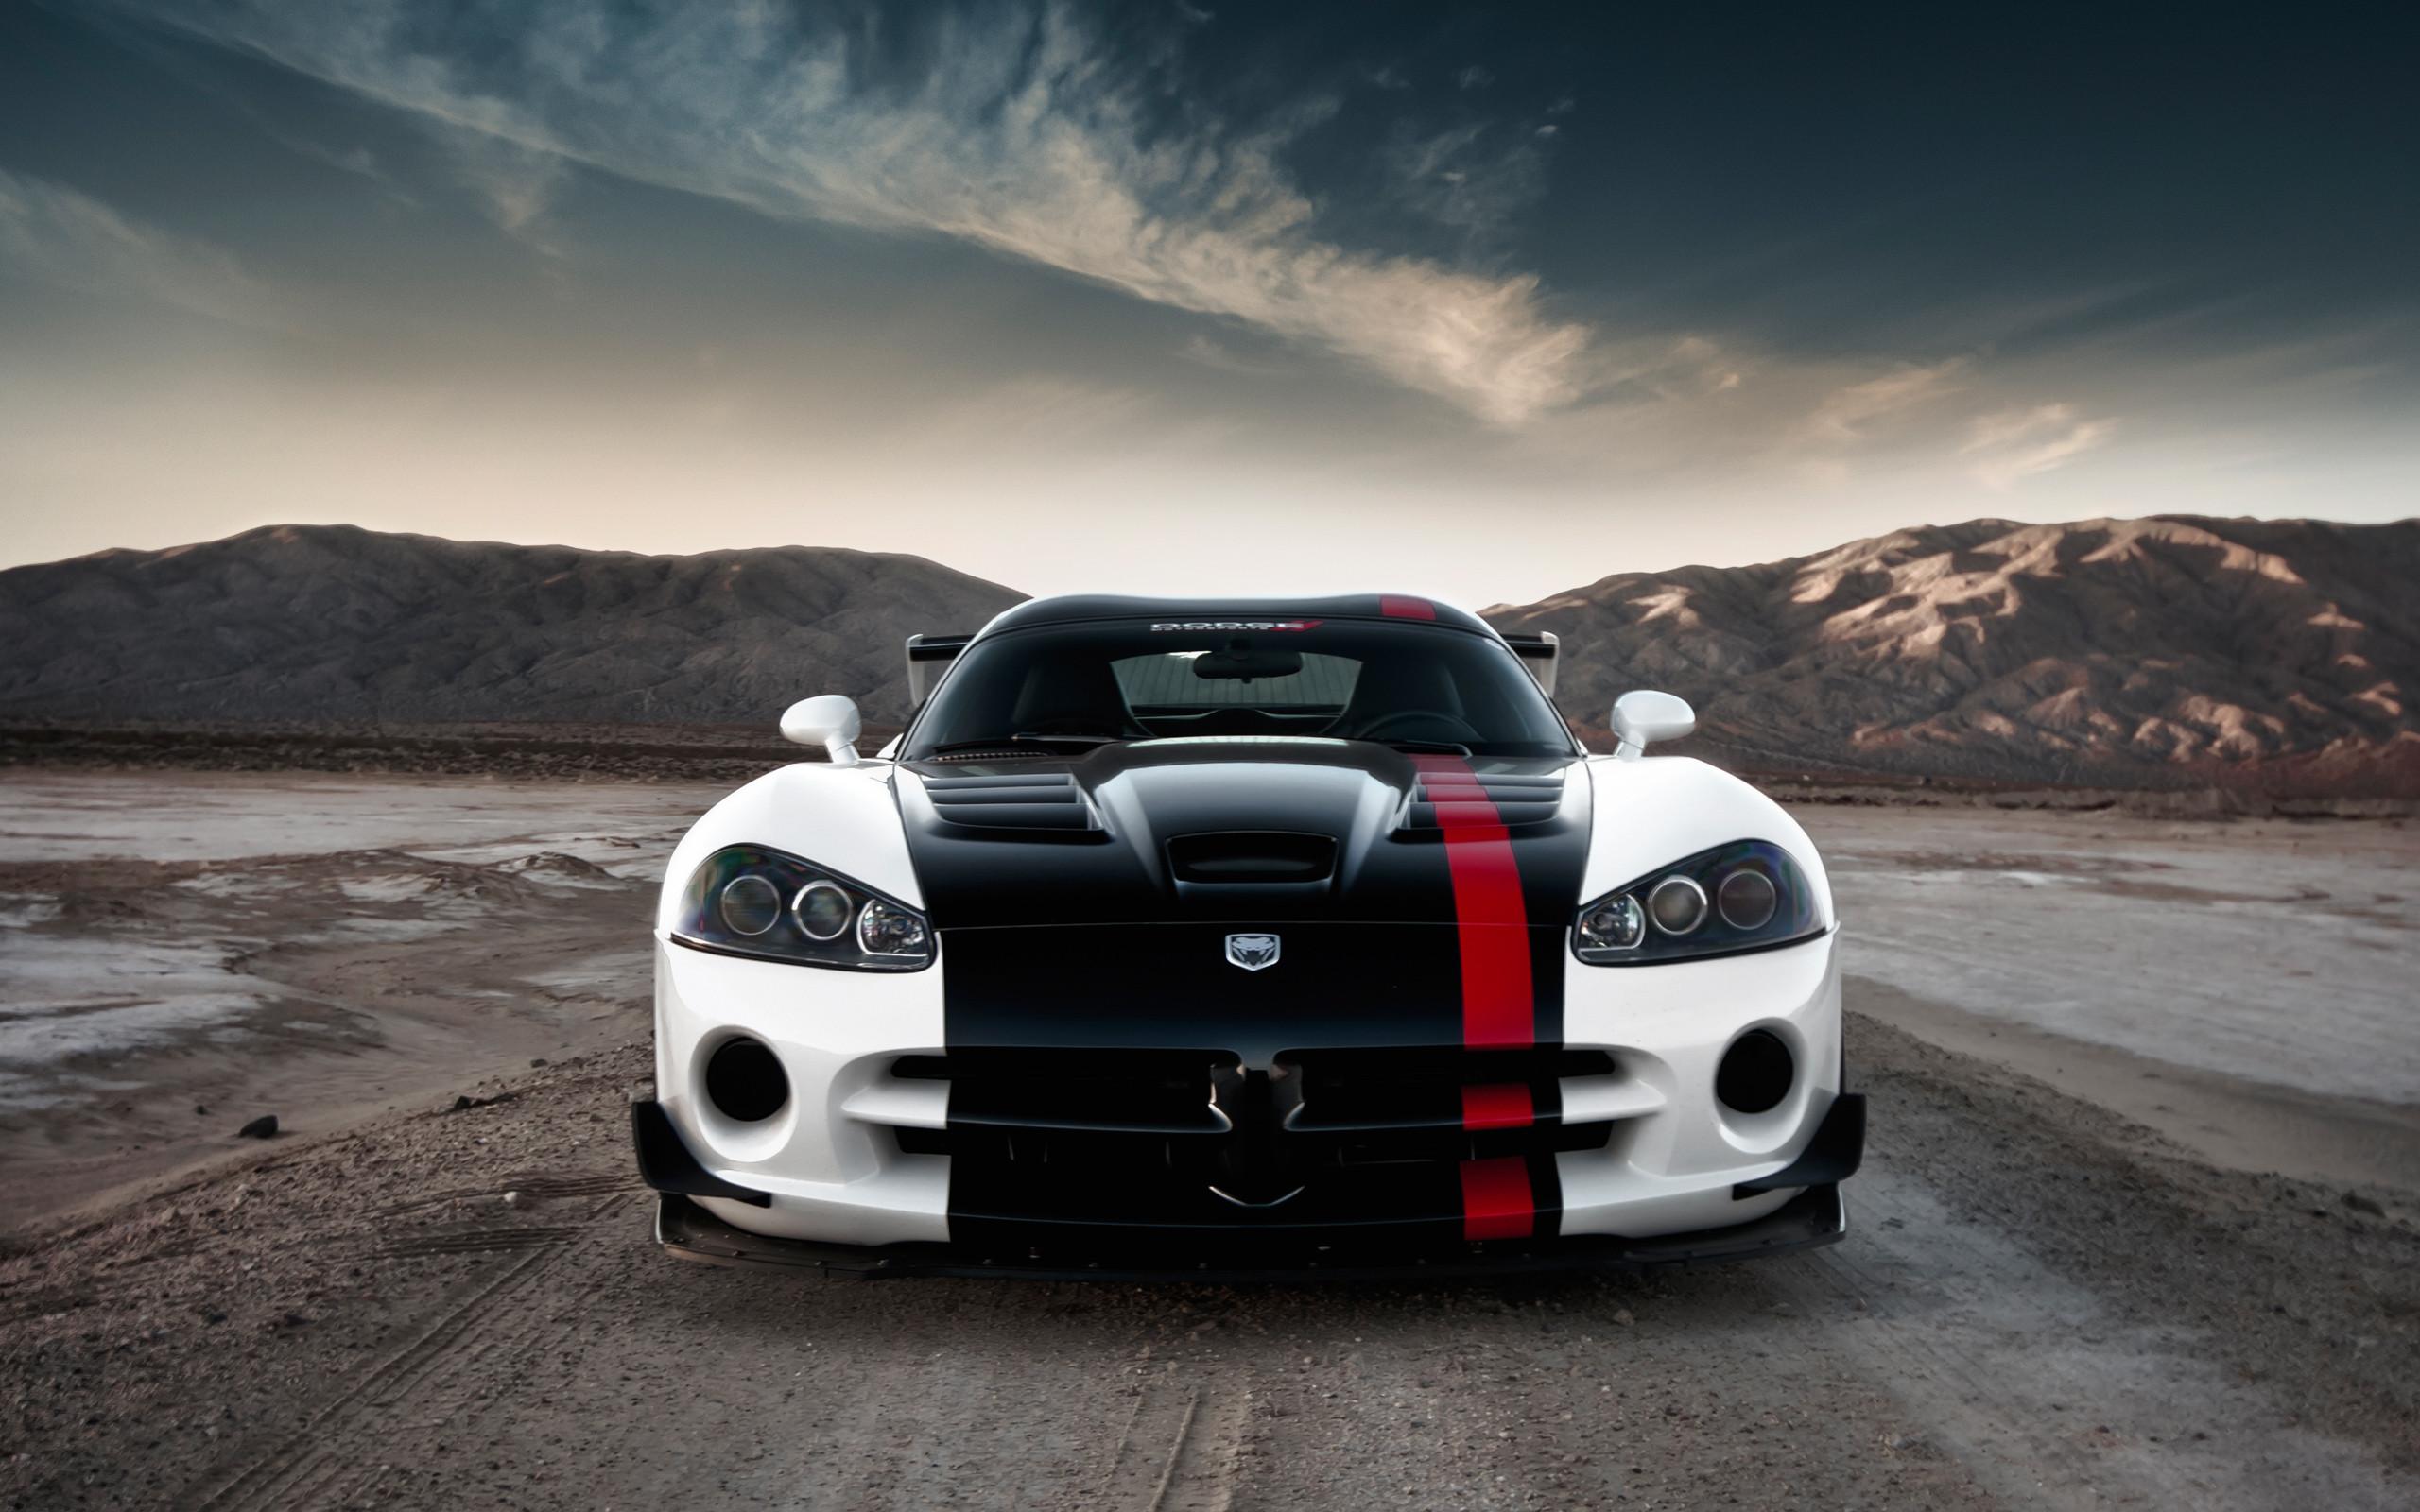 2560x1440 2017 Dodge Viper Final Edition 3